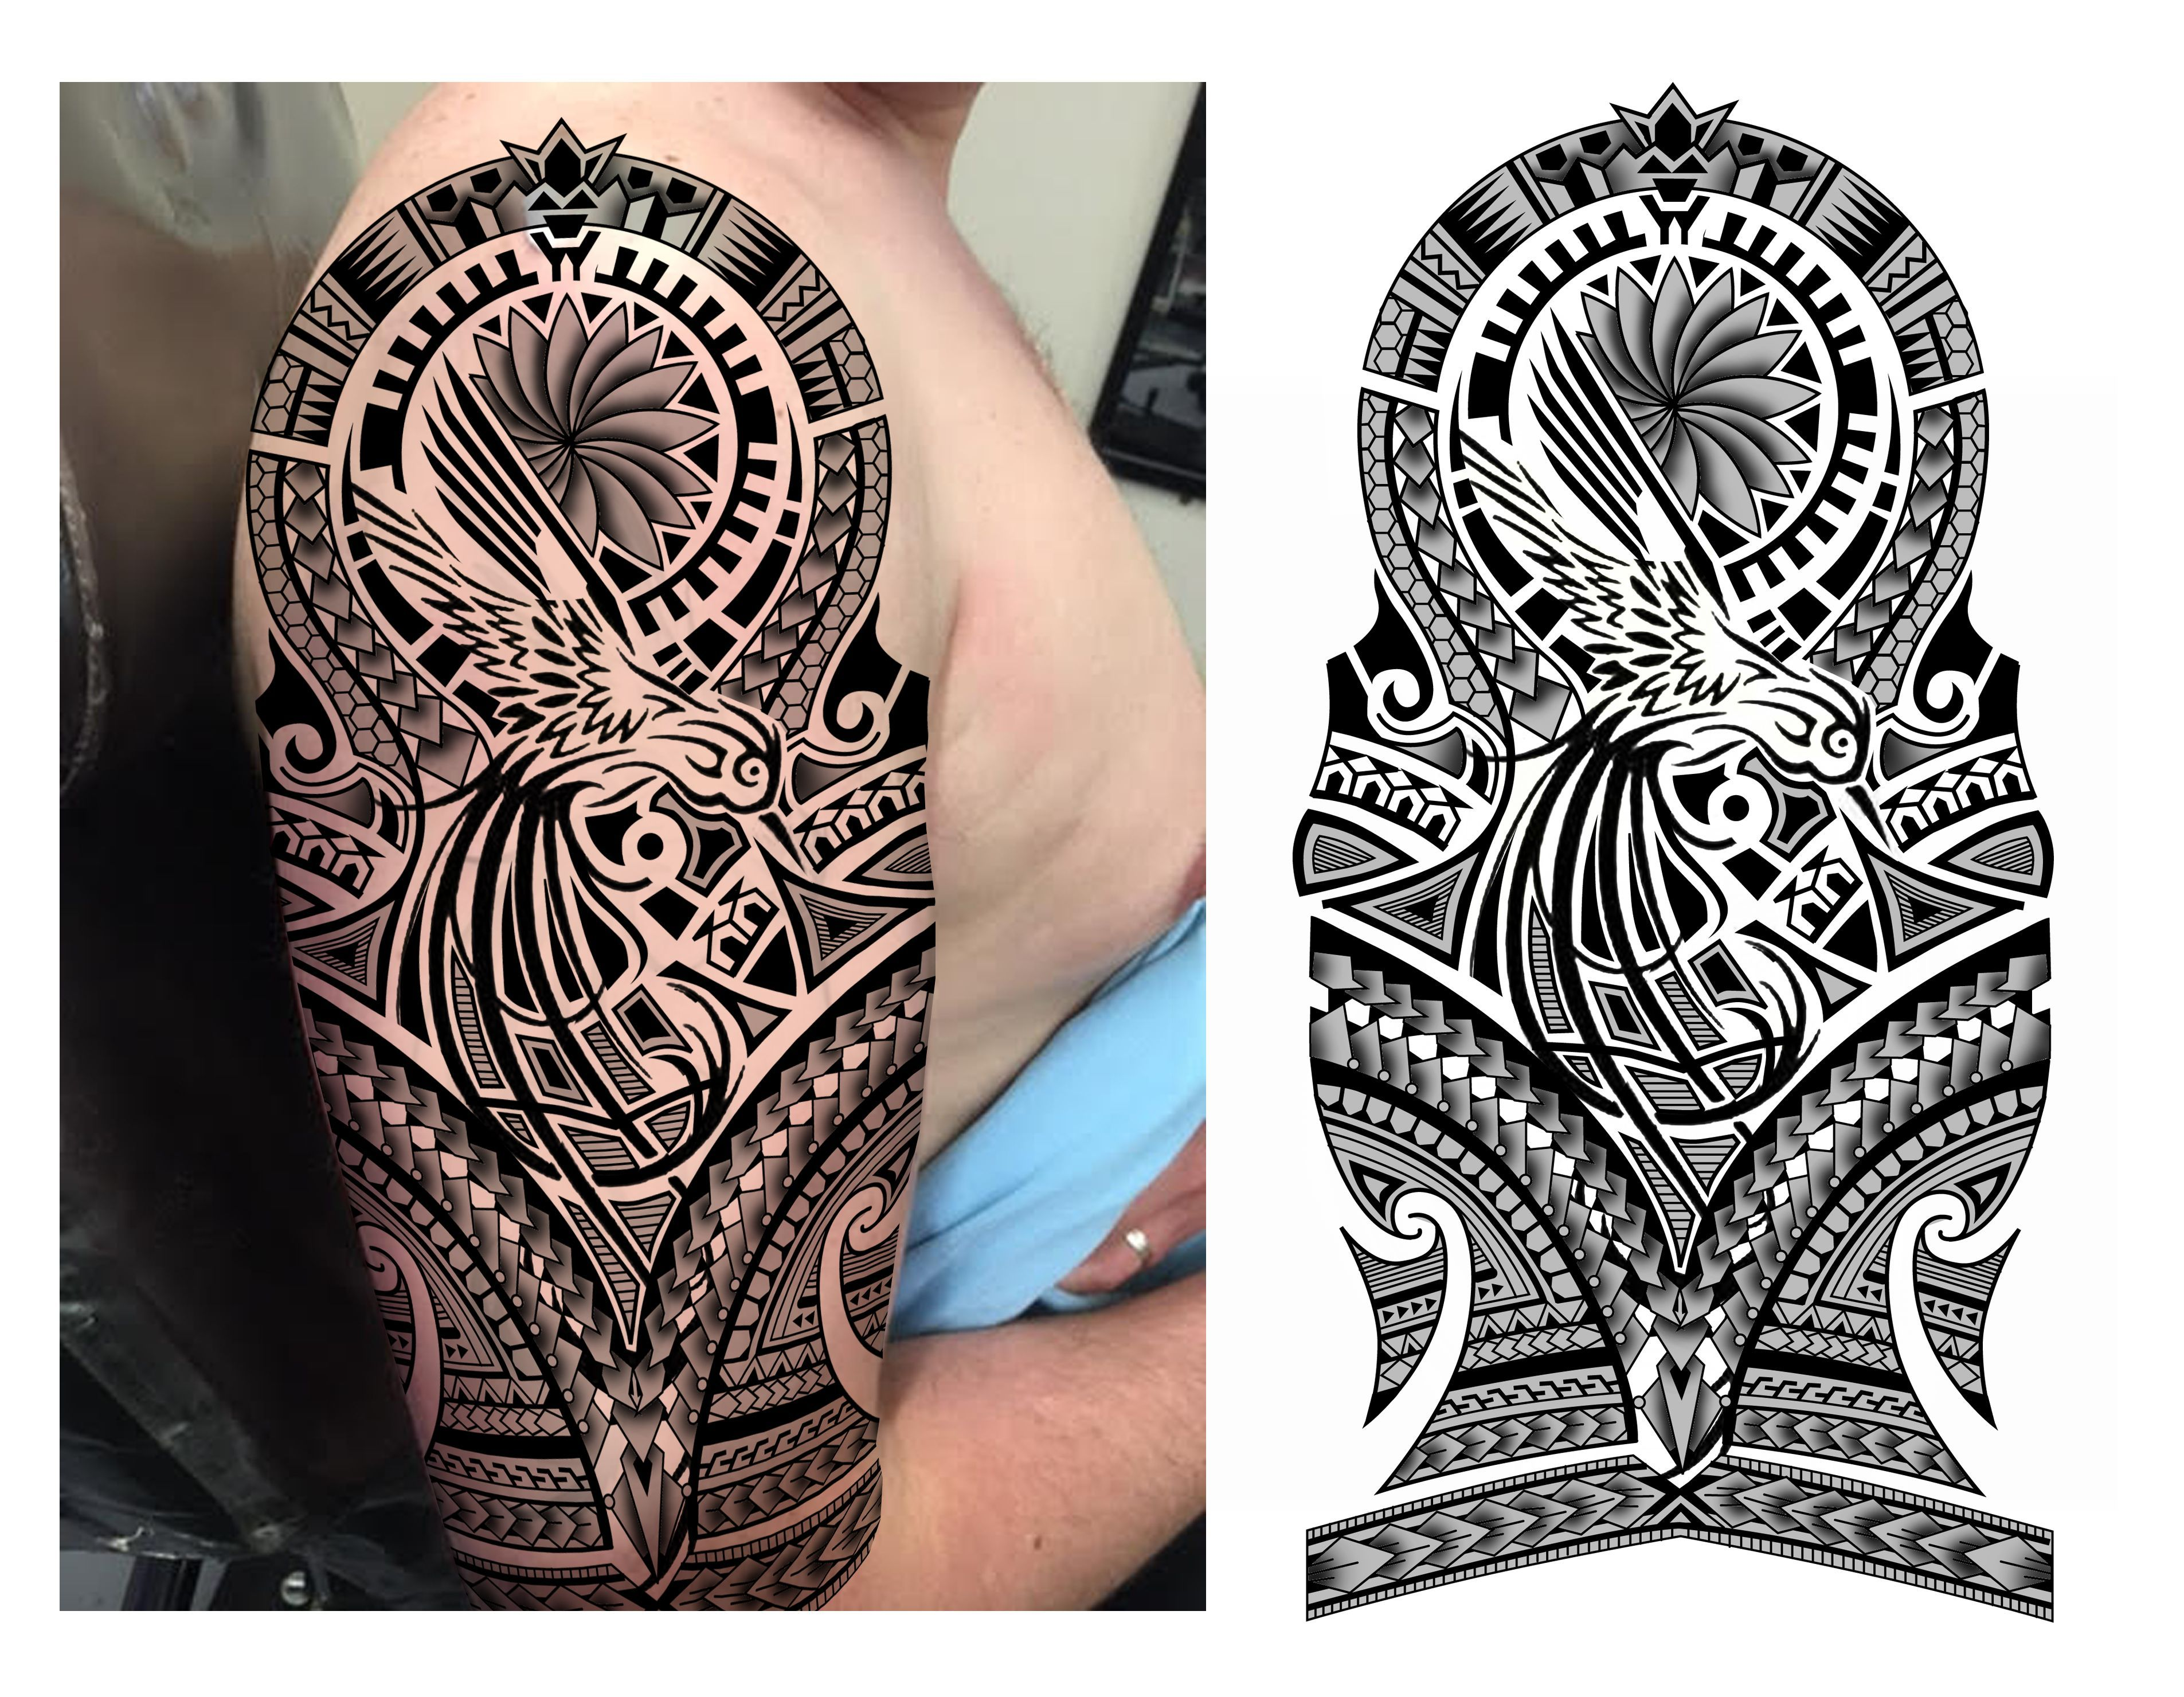 Hummingbird Maori Polynesian Tribal Half Sleeve Tattoo